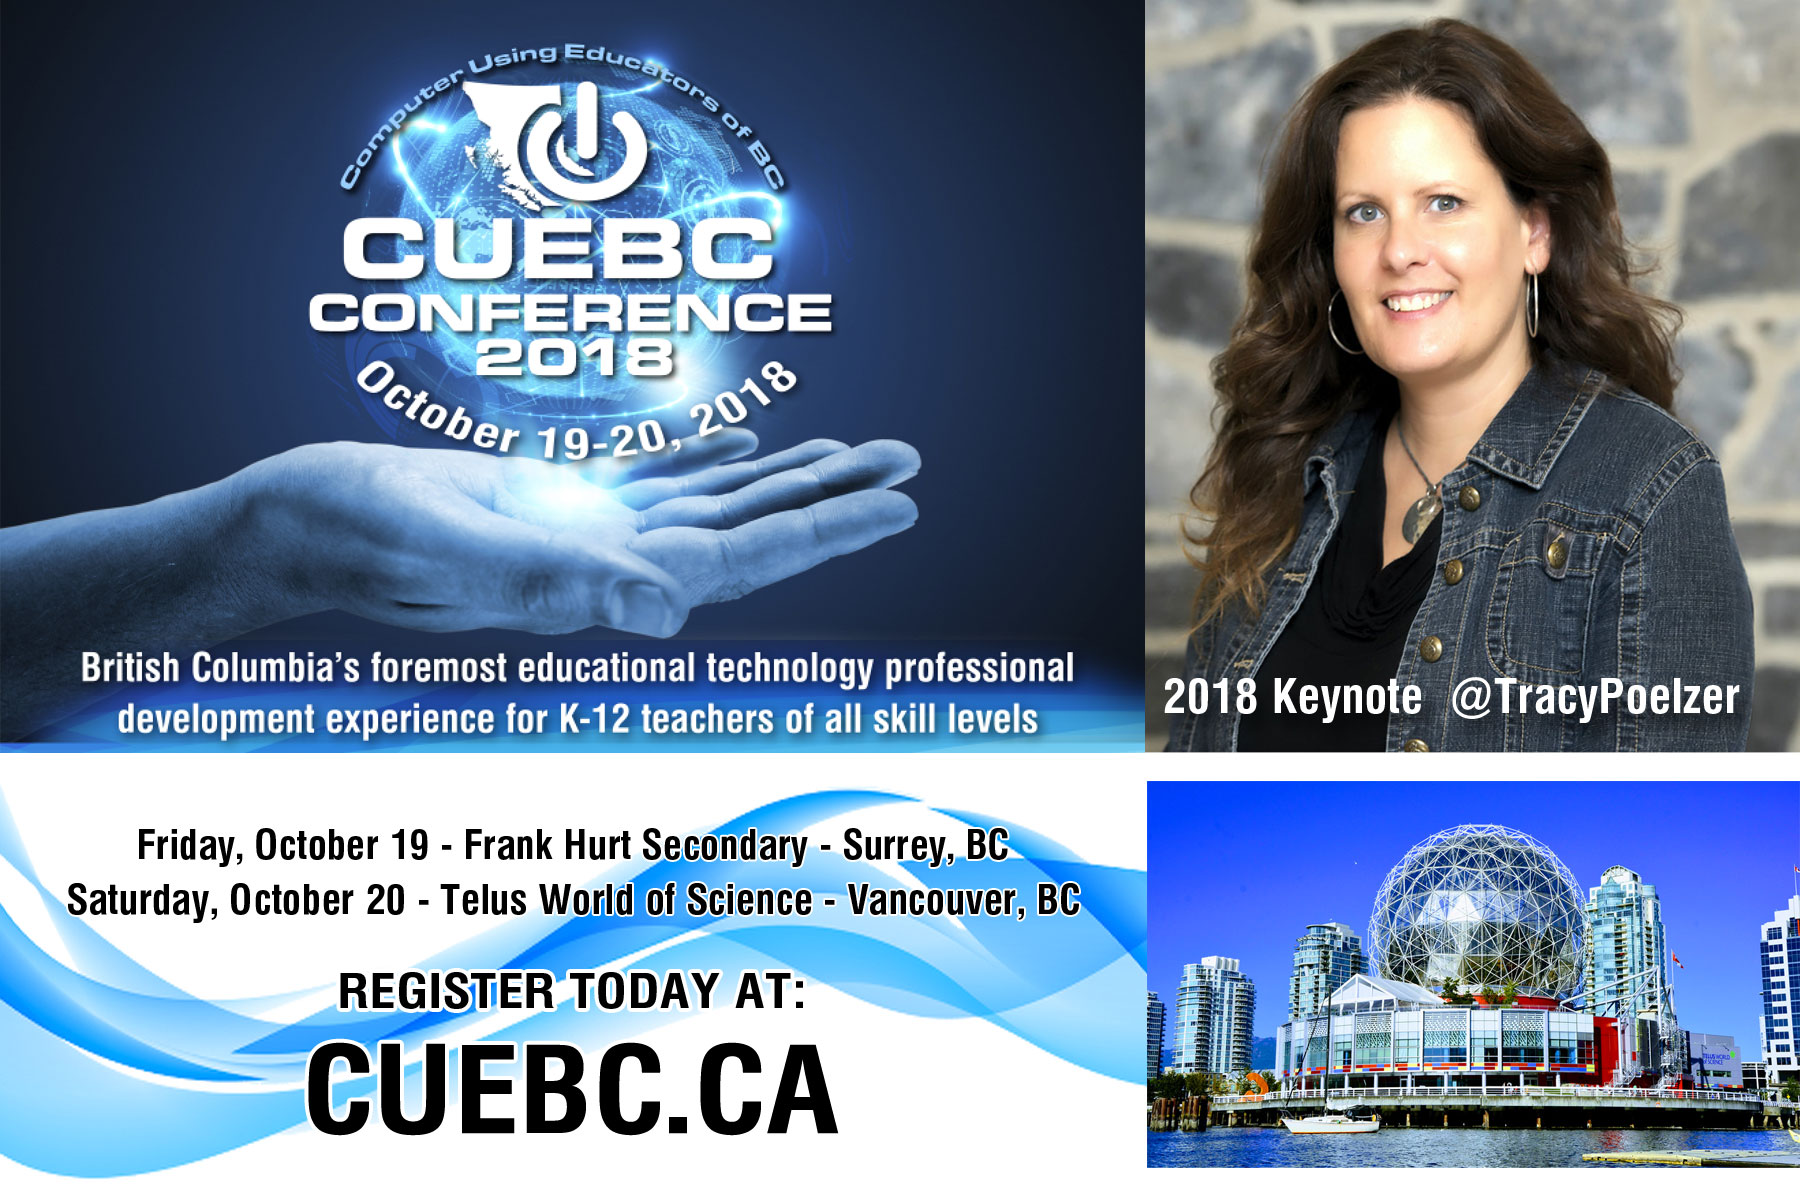 Call for CUEBC PSA 2018 Presenters